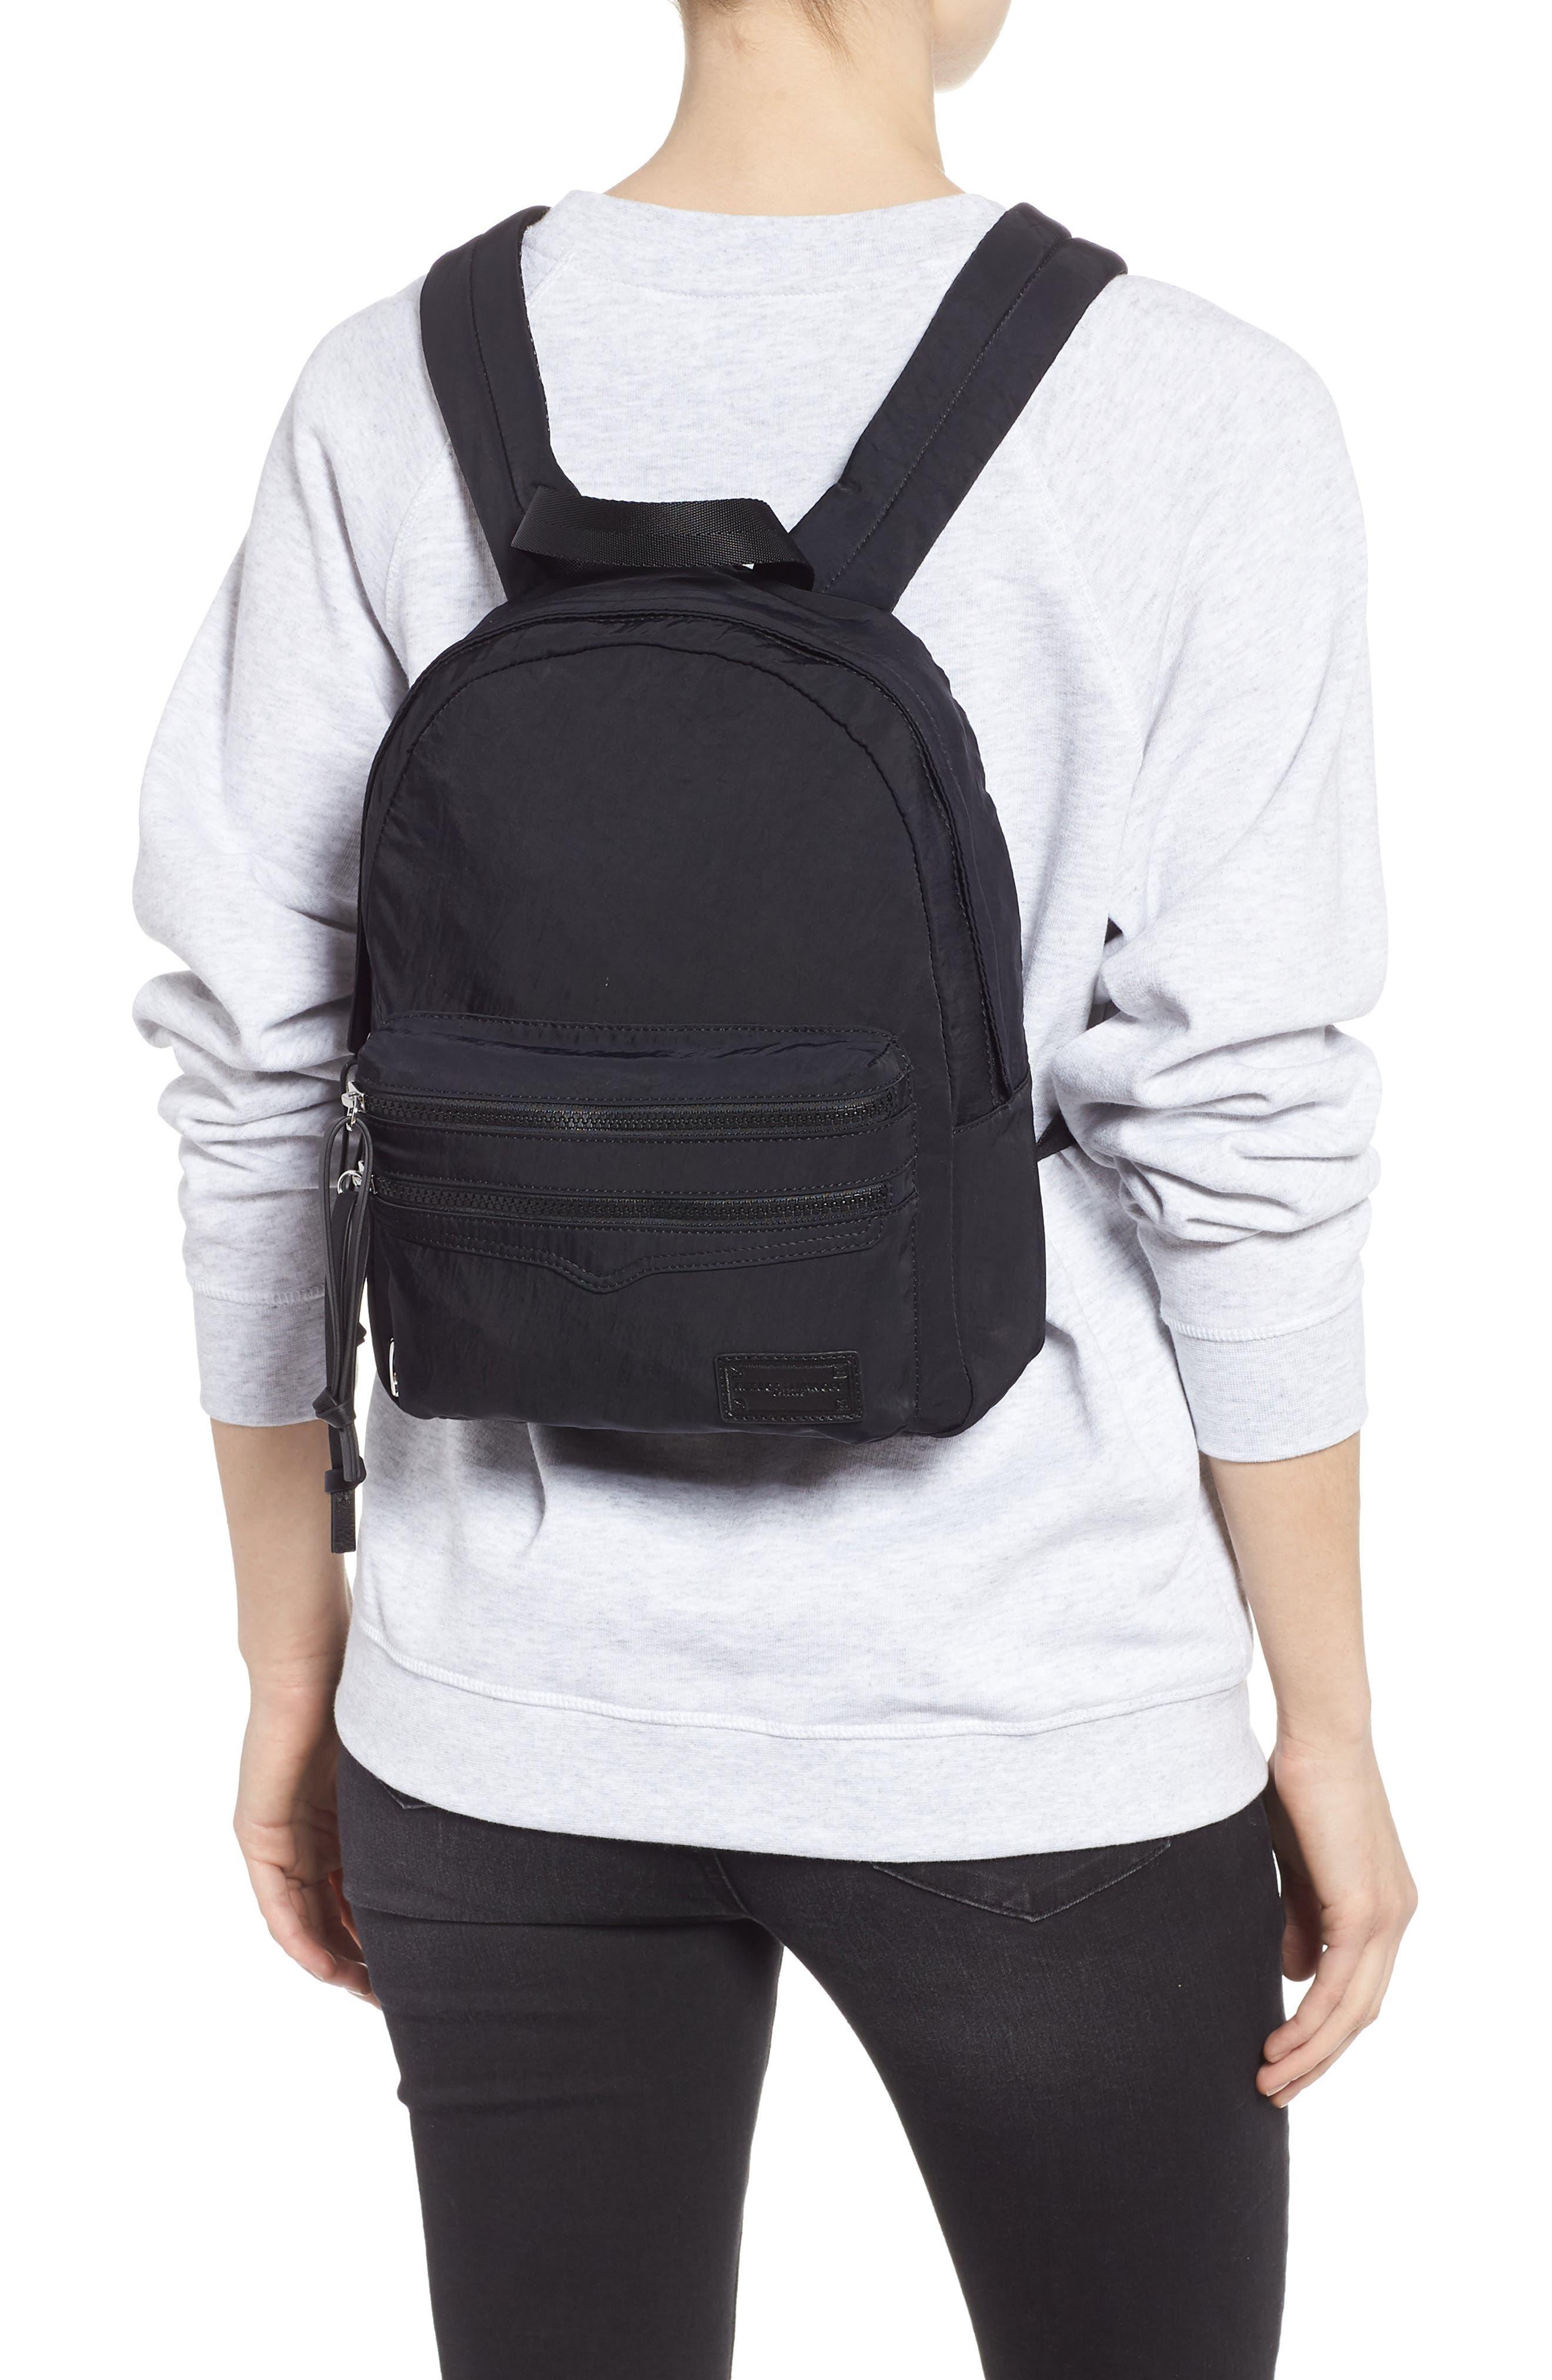 REBECCA MINKOFF, Nylon Backpack, Alternate thumbnail 2, color, BLACK